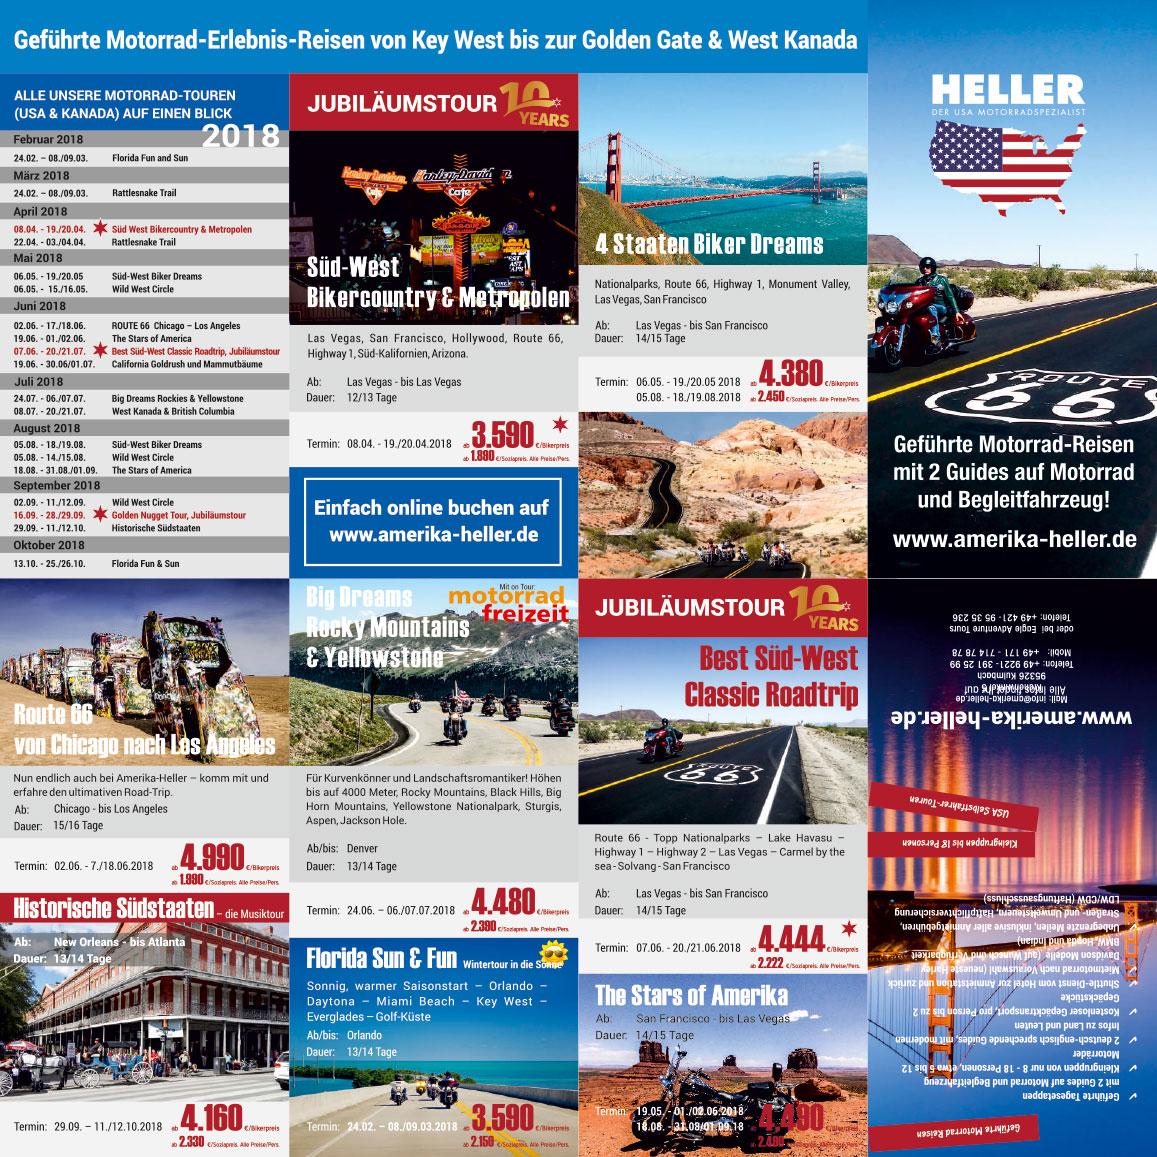 Grafik & Design Referenzen: Reiner Heller JH Amerika-Heller, Las Vegas, USA - Kulmbach, DE